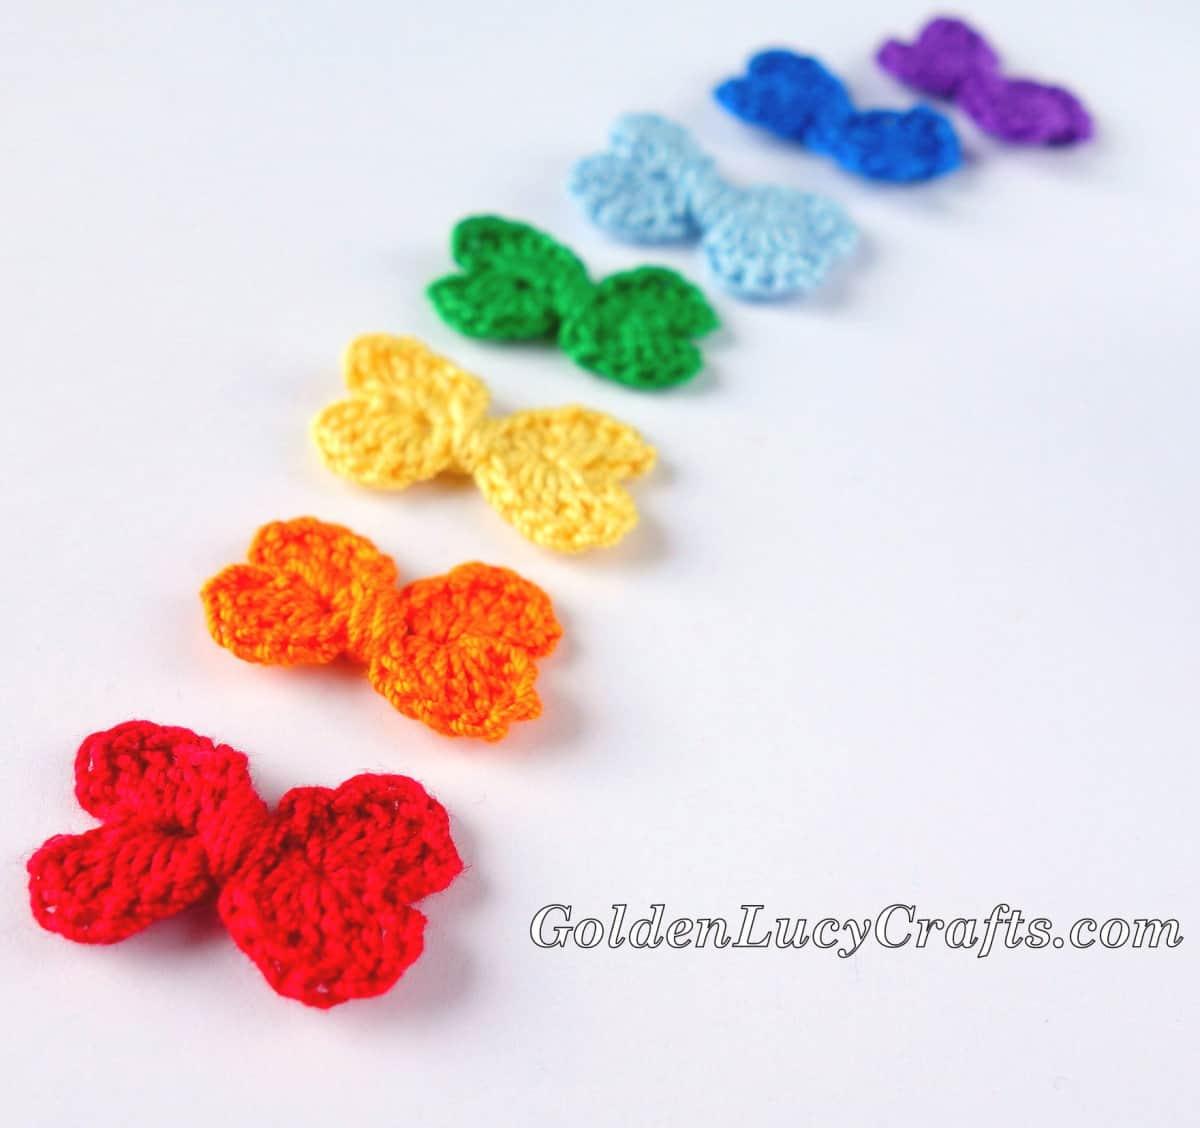 Crochet small bows.